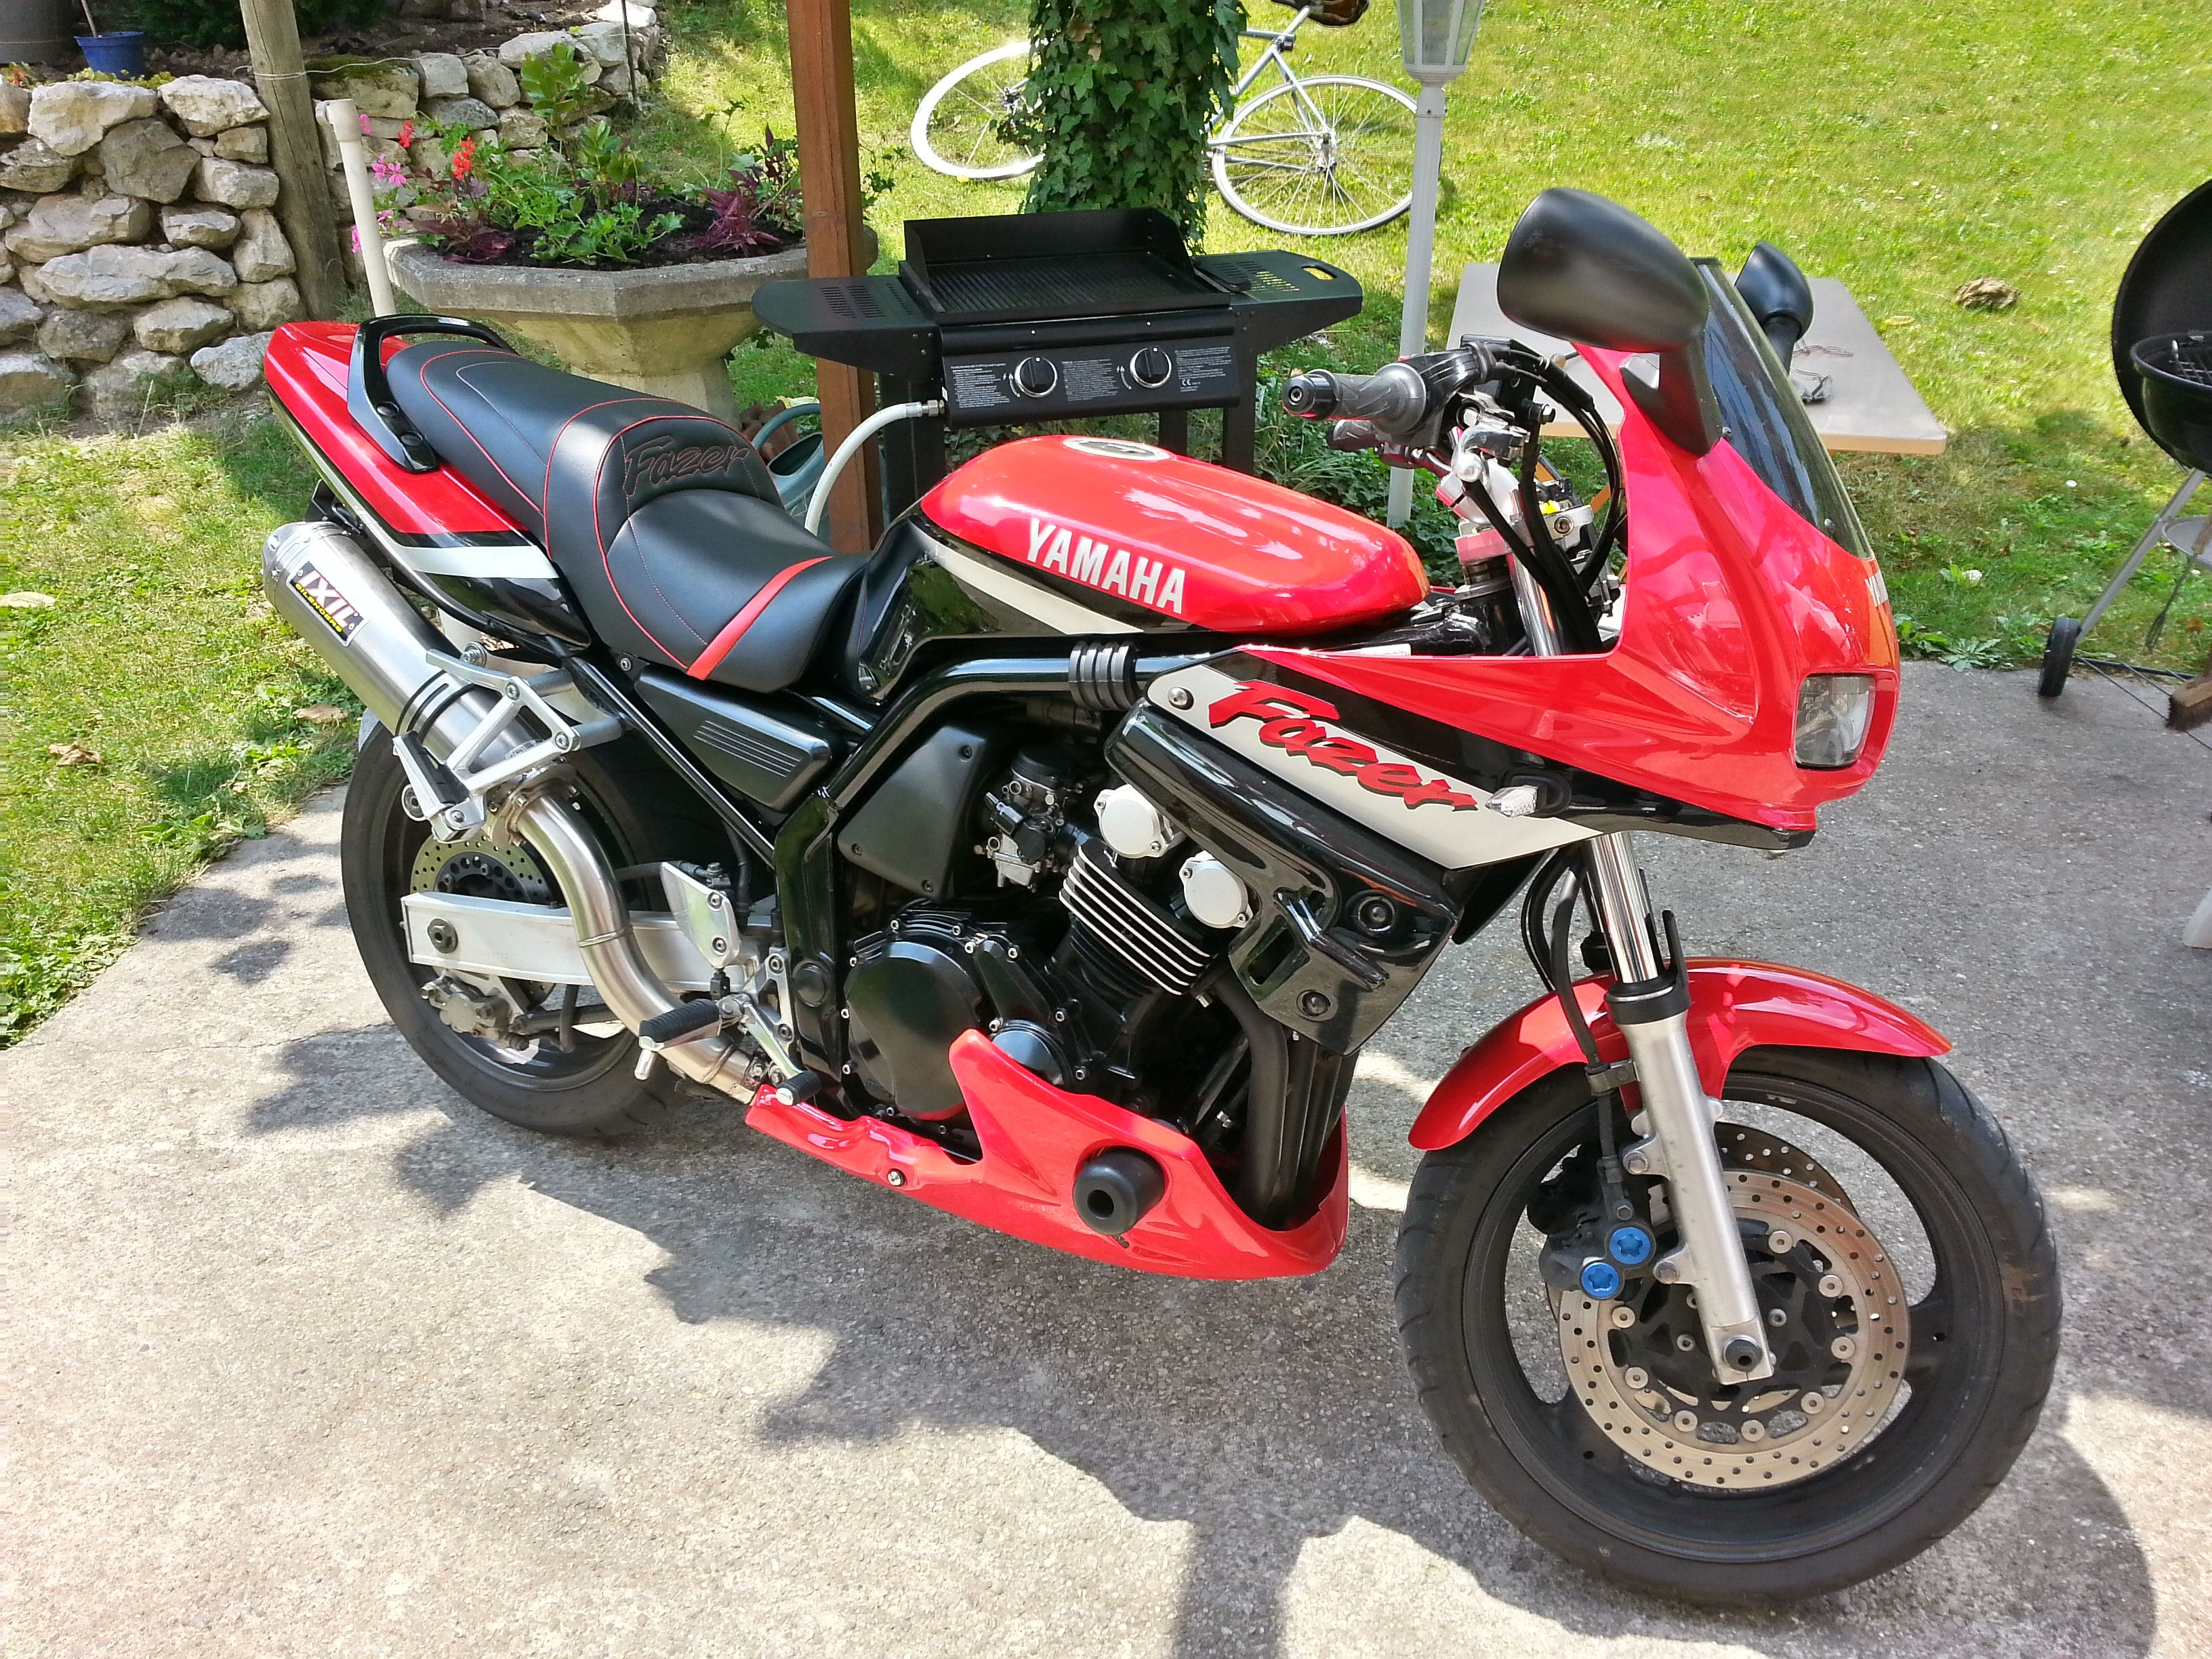 Yamaha fazer 600 home passions pinterest for Garage yamaha scooter